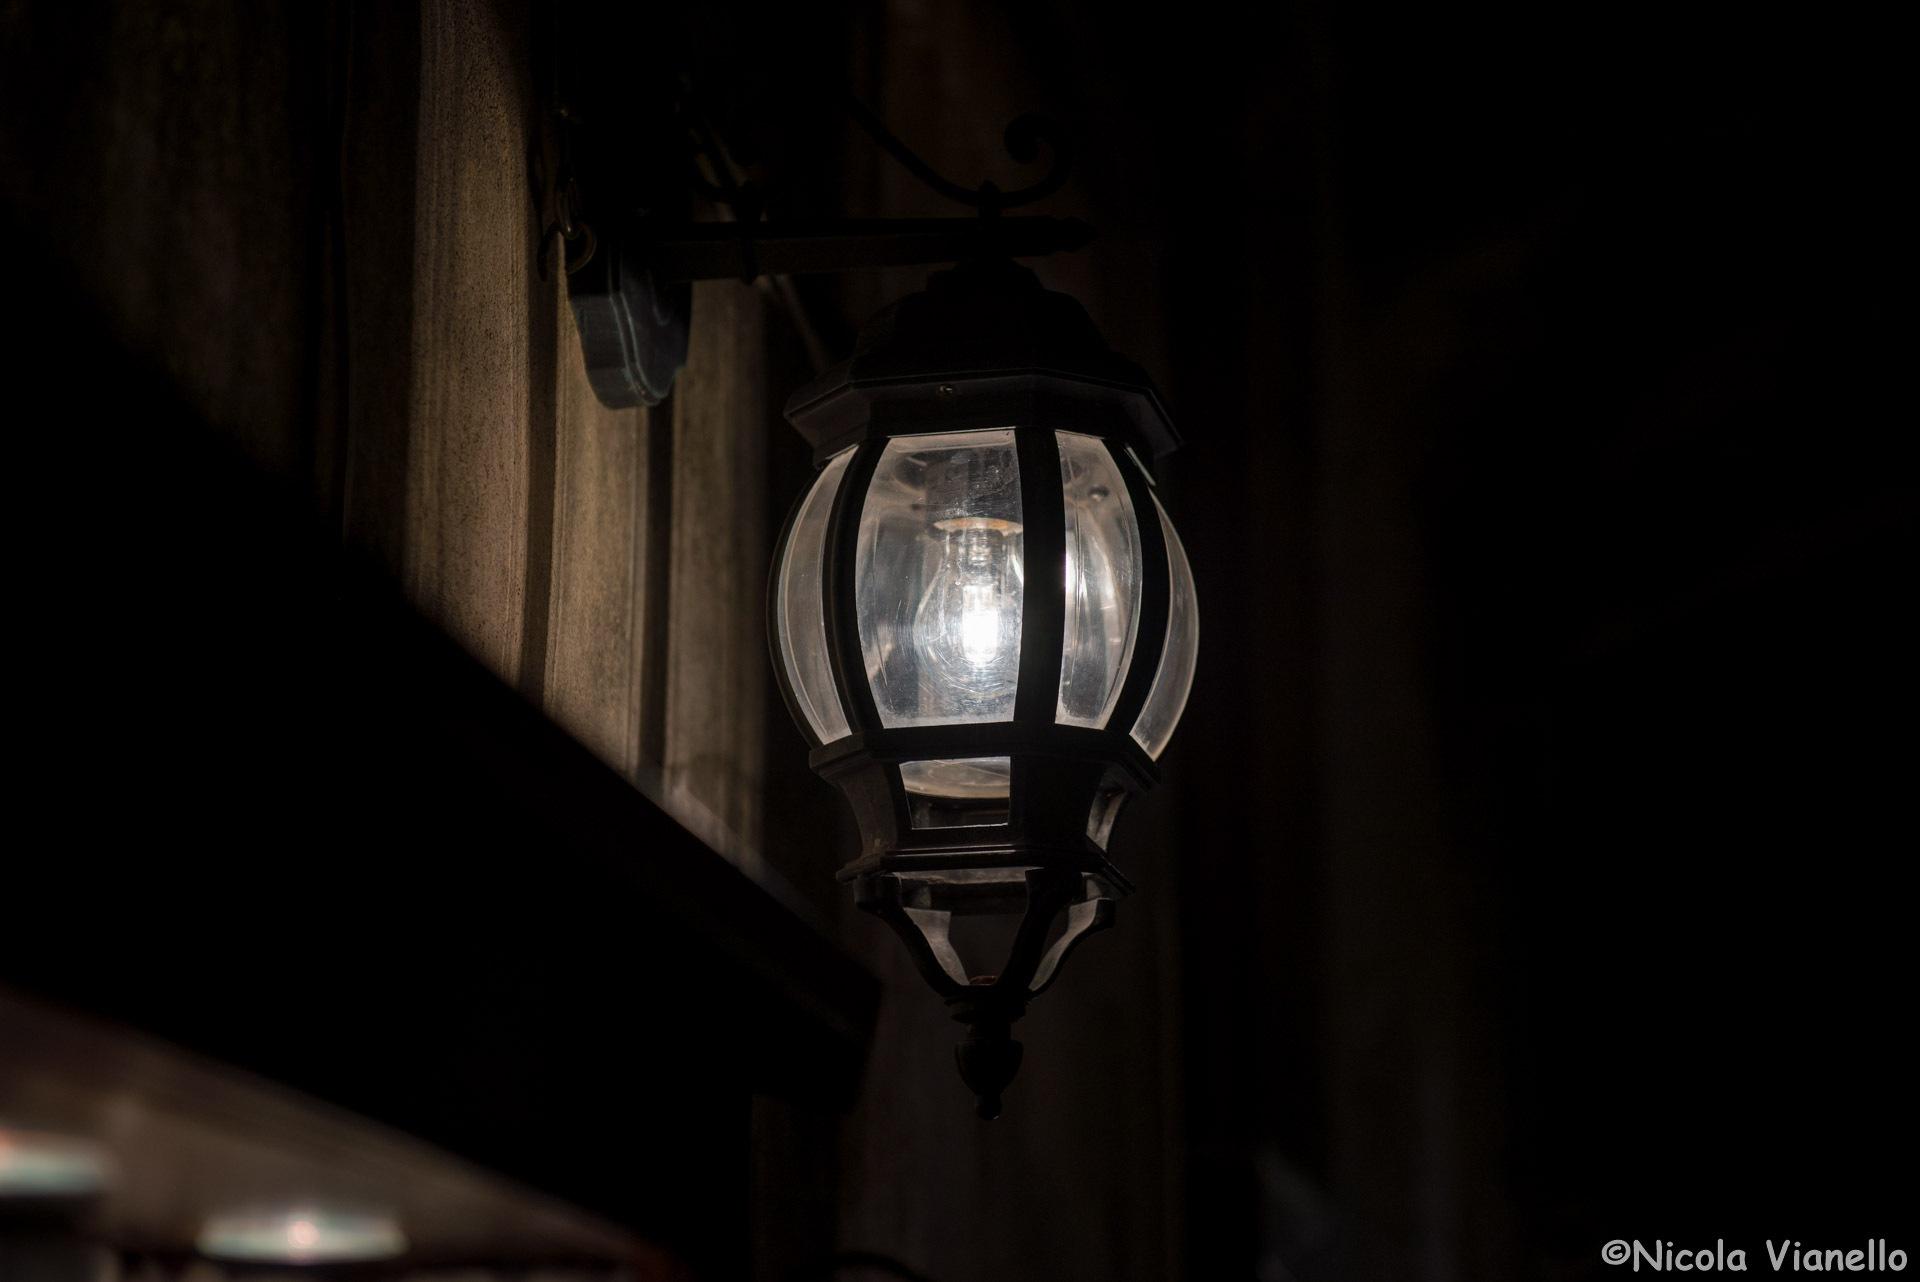 A bulblight in Korcula by Nicola Vianello